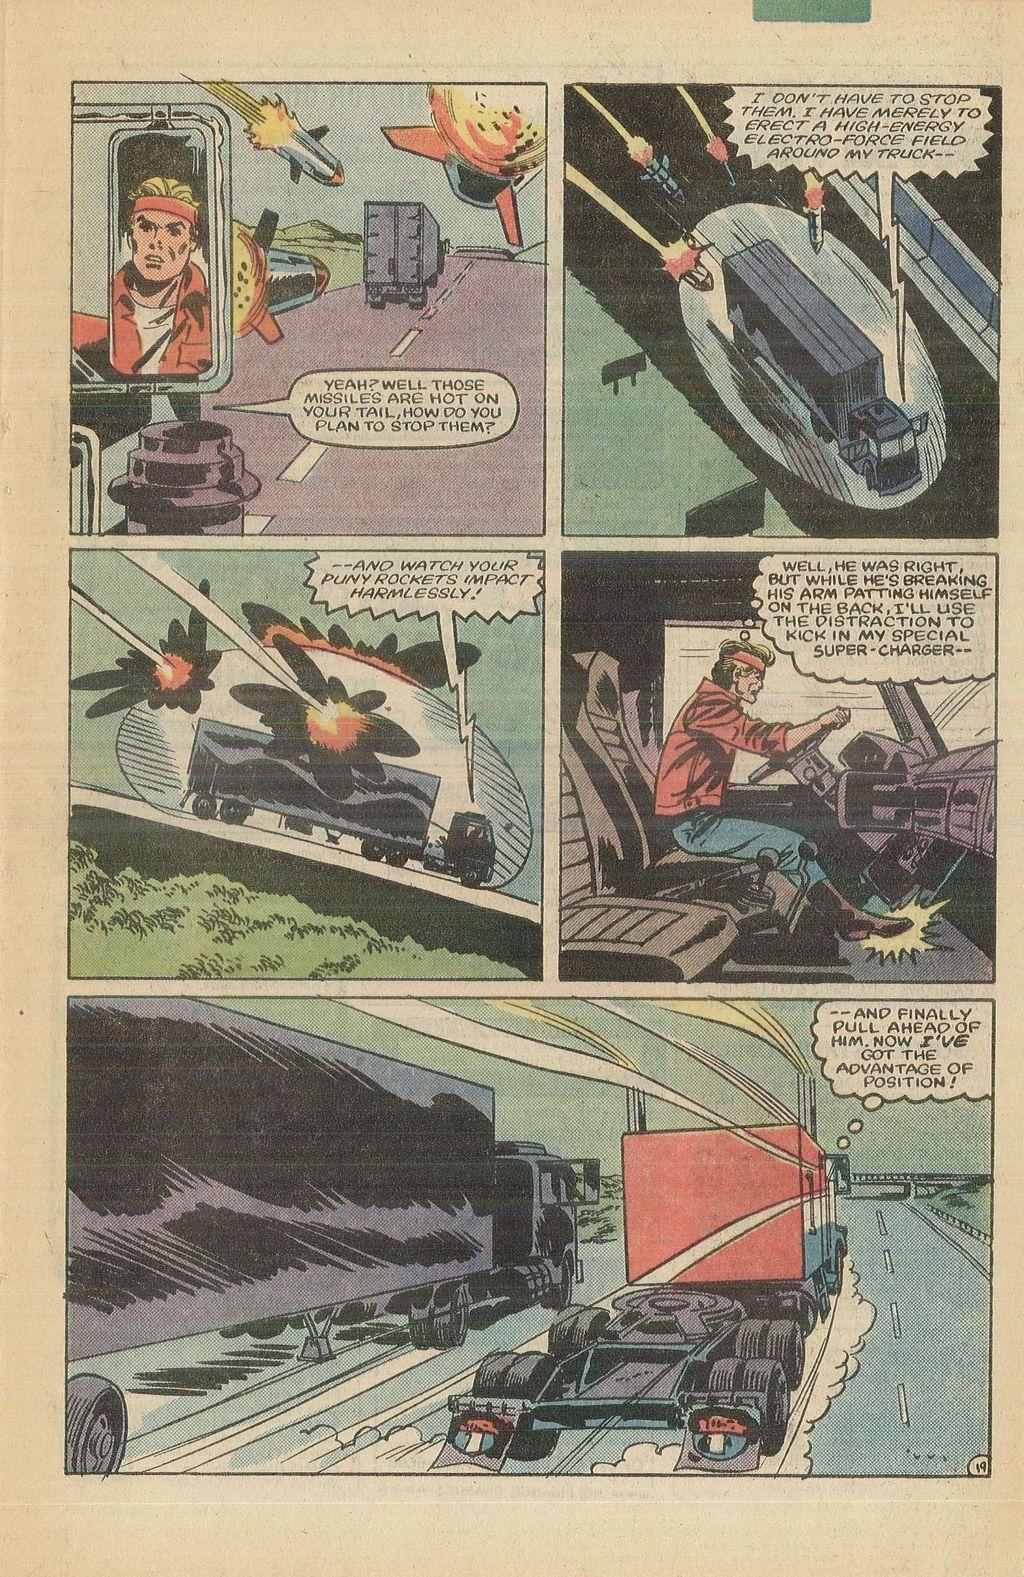 Read online U.S. 1 comic -  Issue #10 - 27